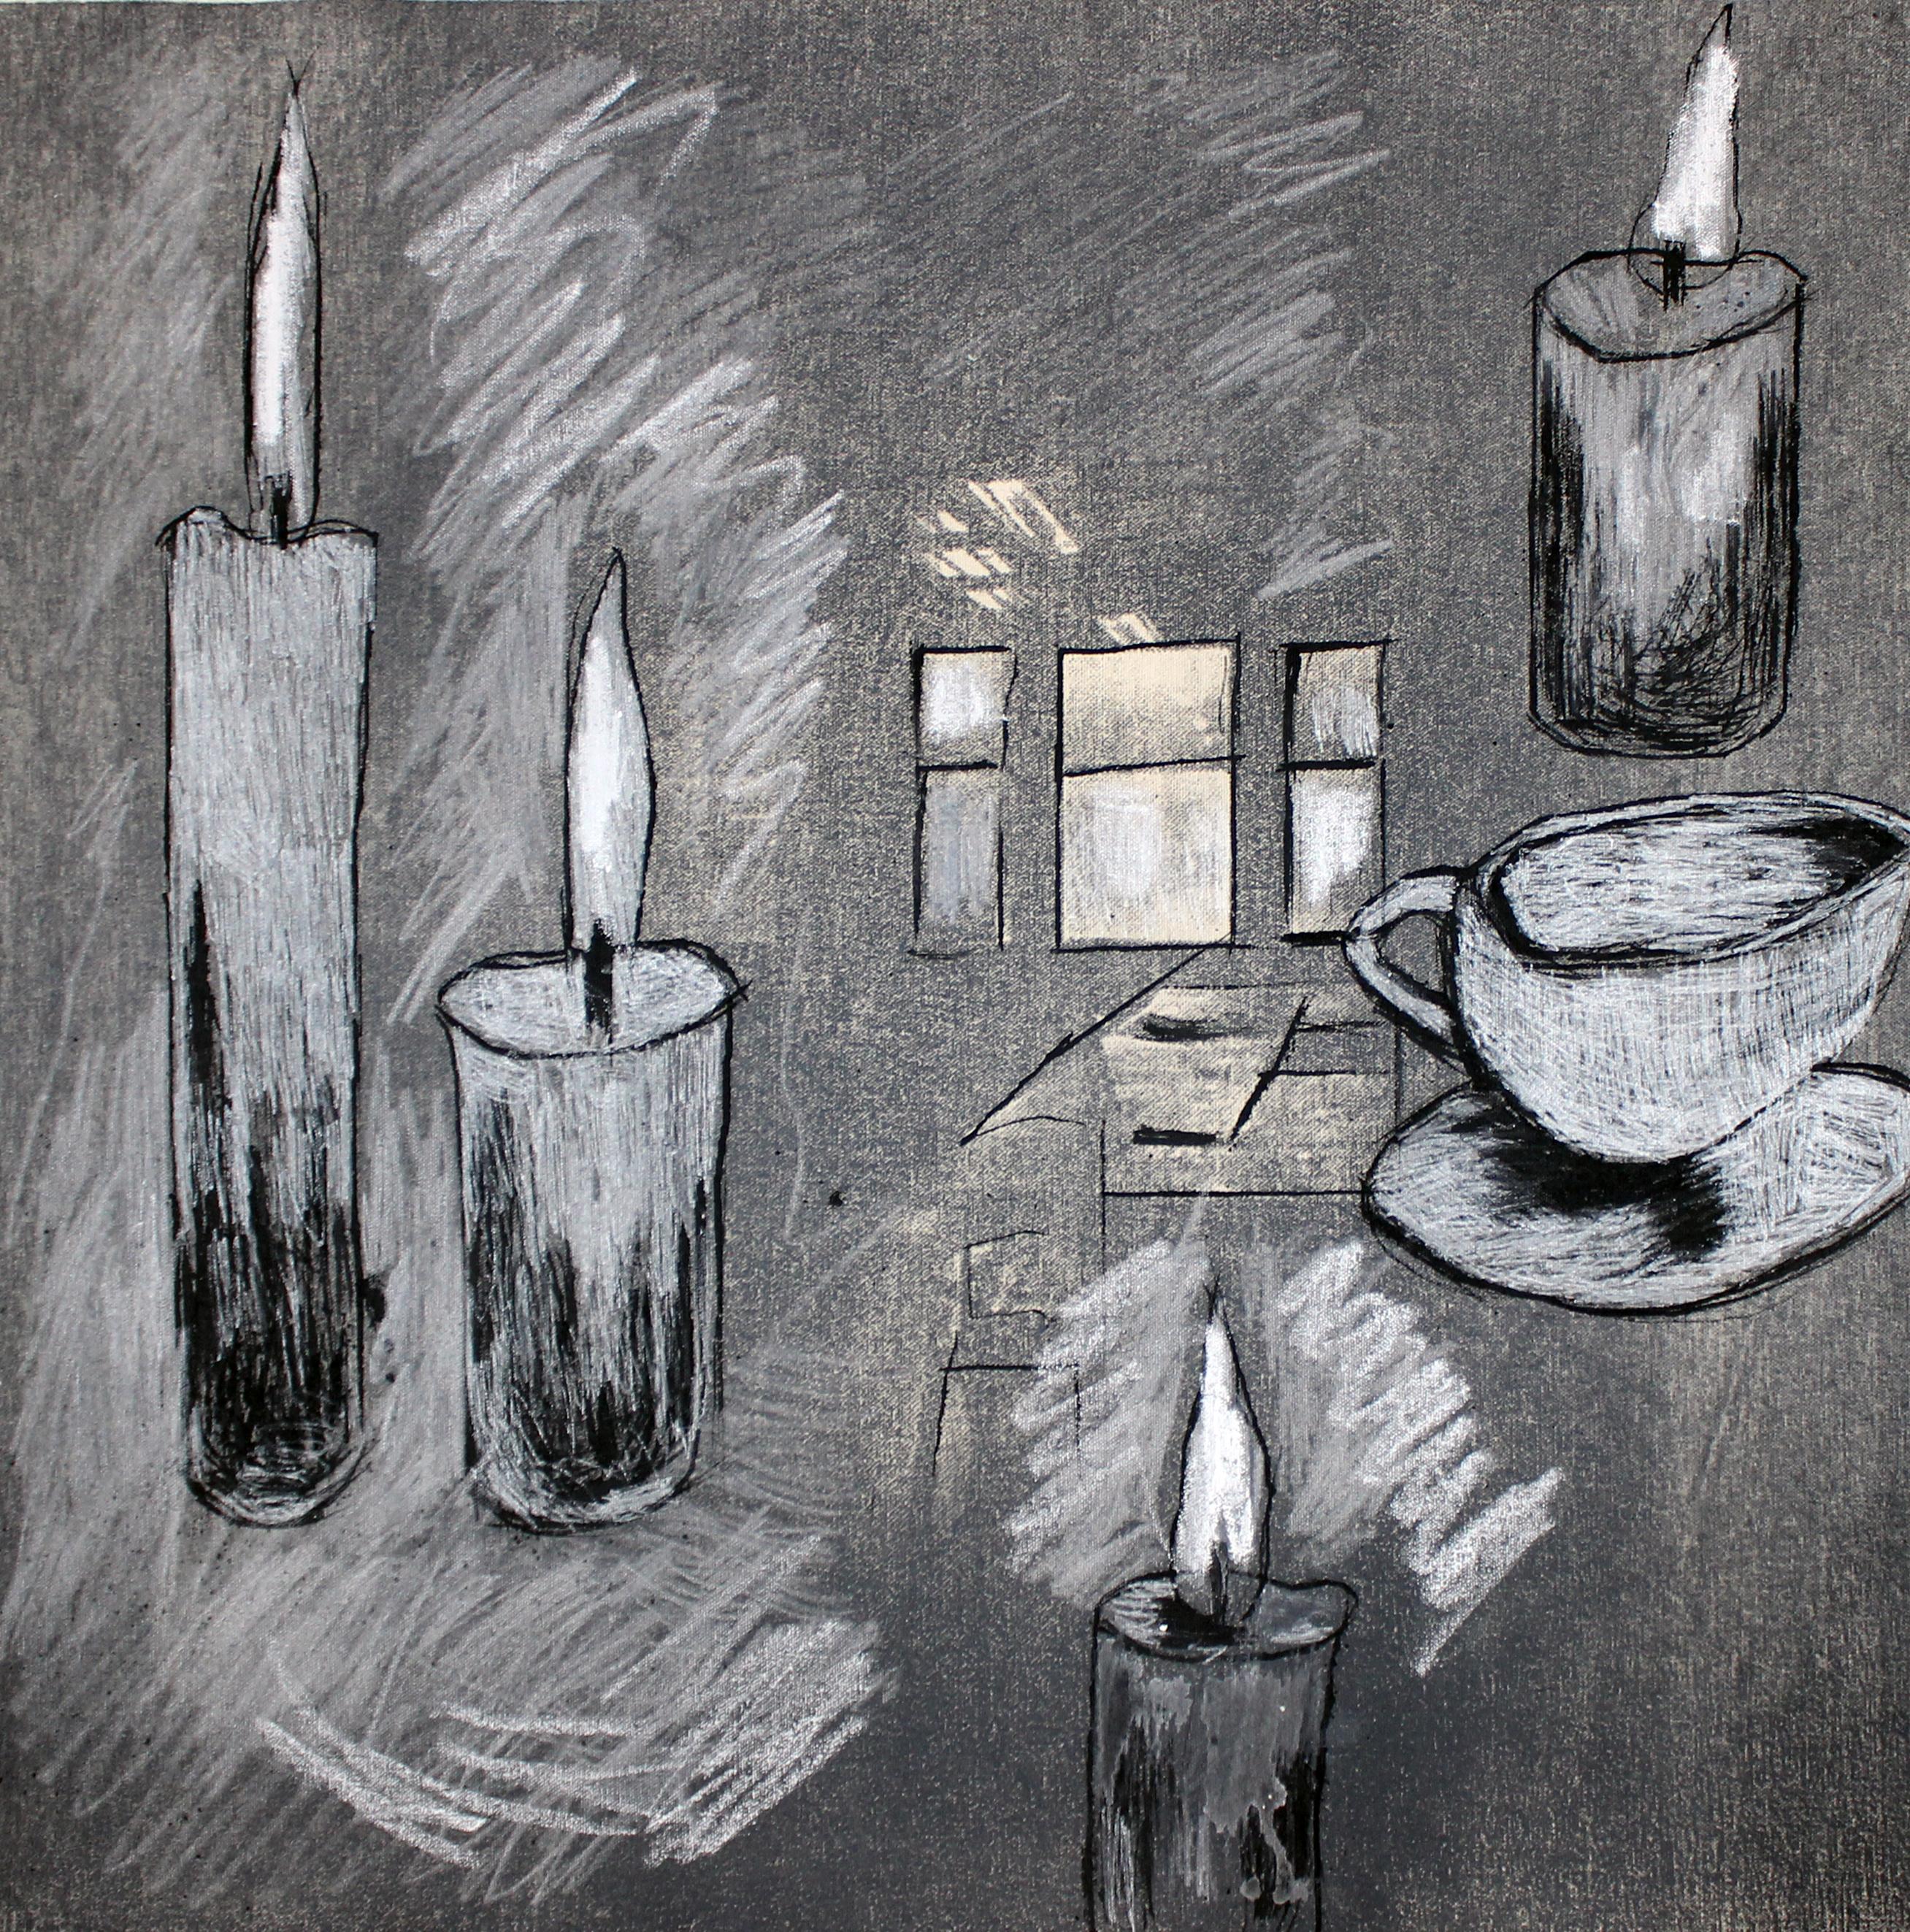 Artwork of the Week – 'Tea Party' by Consuelo Servan & Jonathan McKinstry